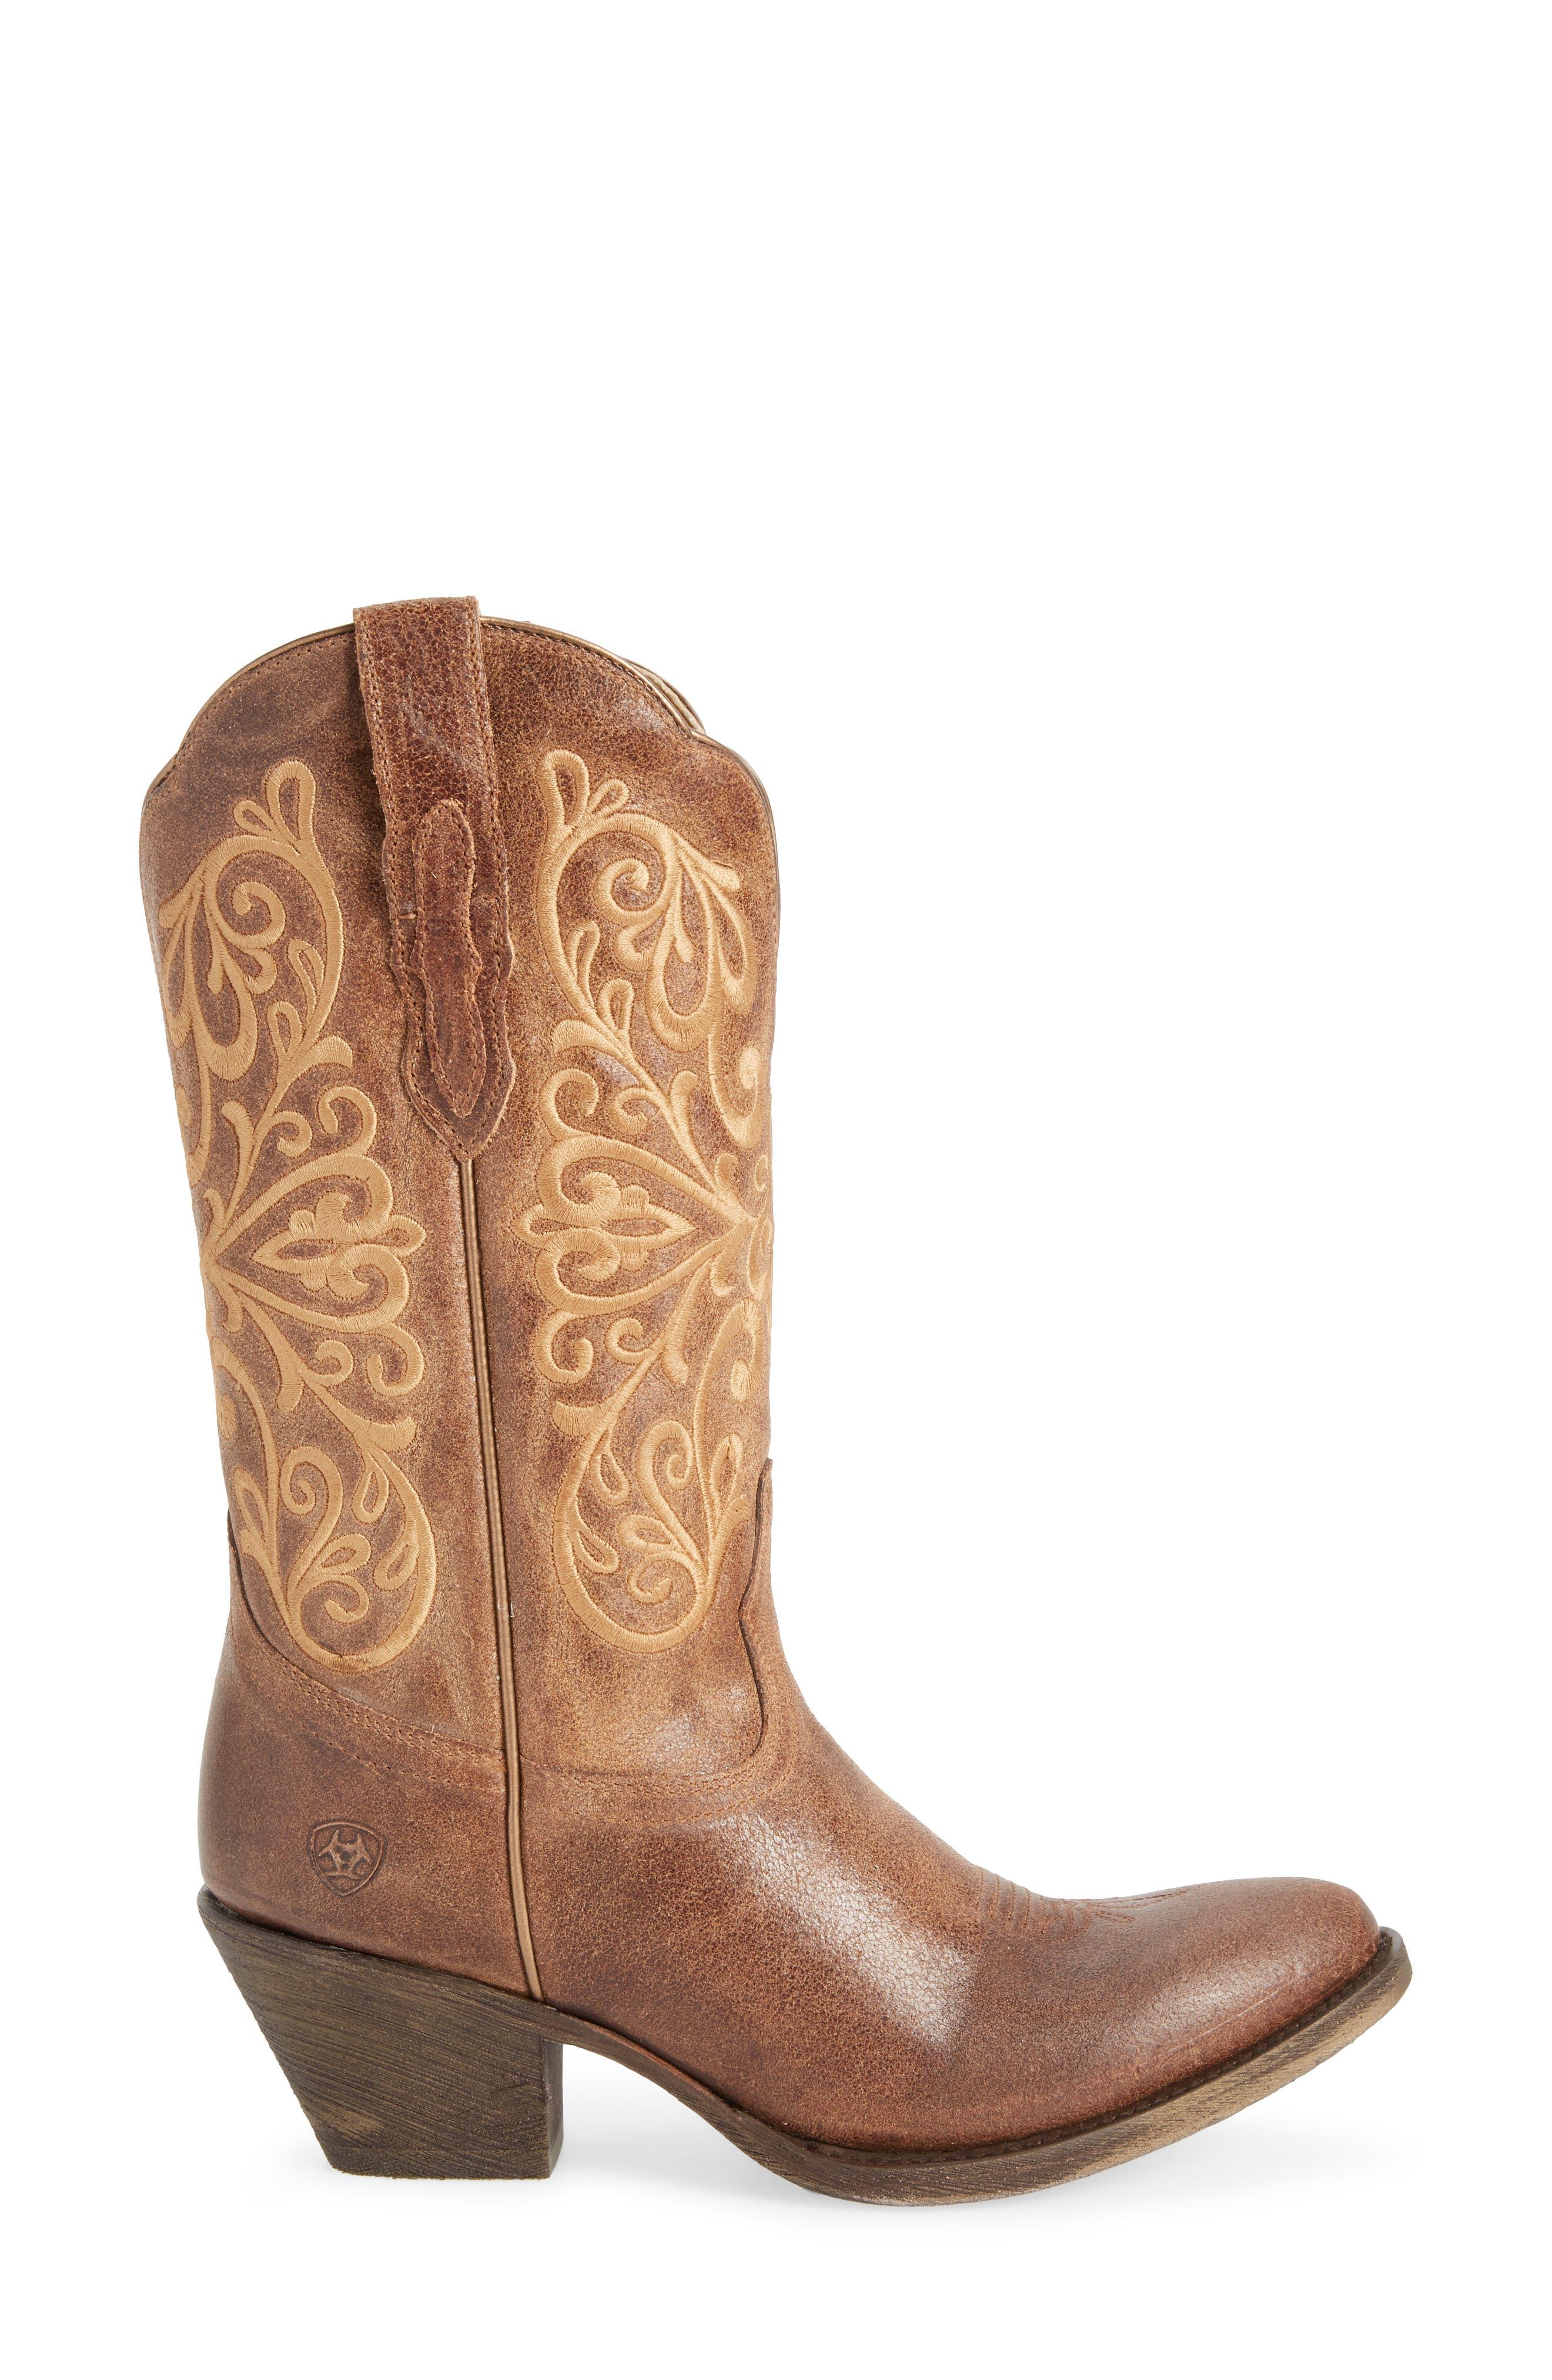 Terra Bella Western Boot,                             Alternate thumbnail 3, color,                             TURNBACK TAN LEATHER